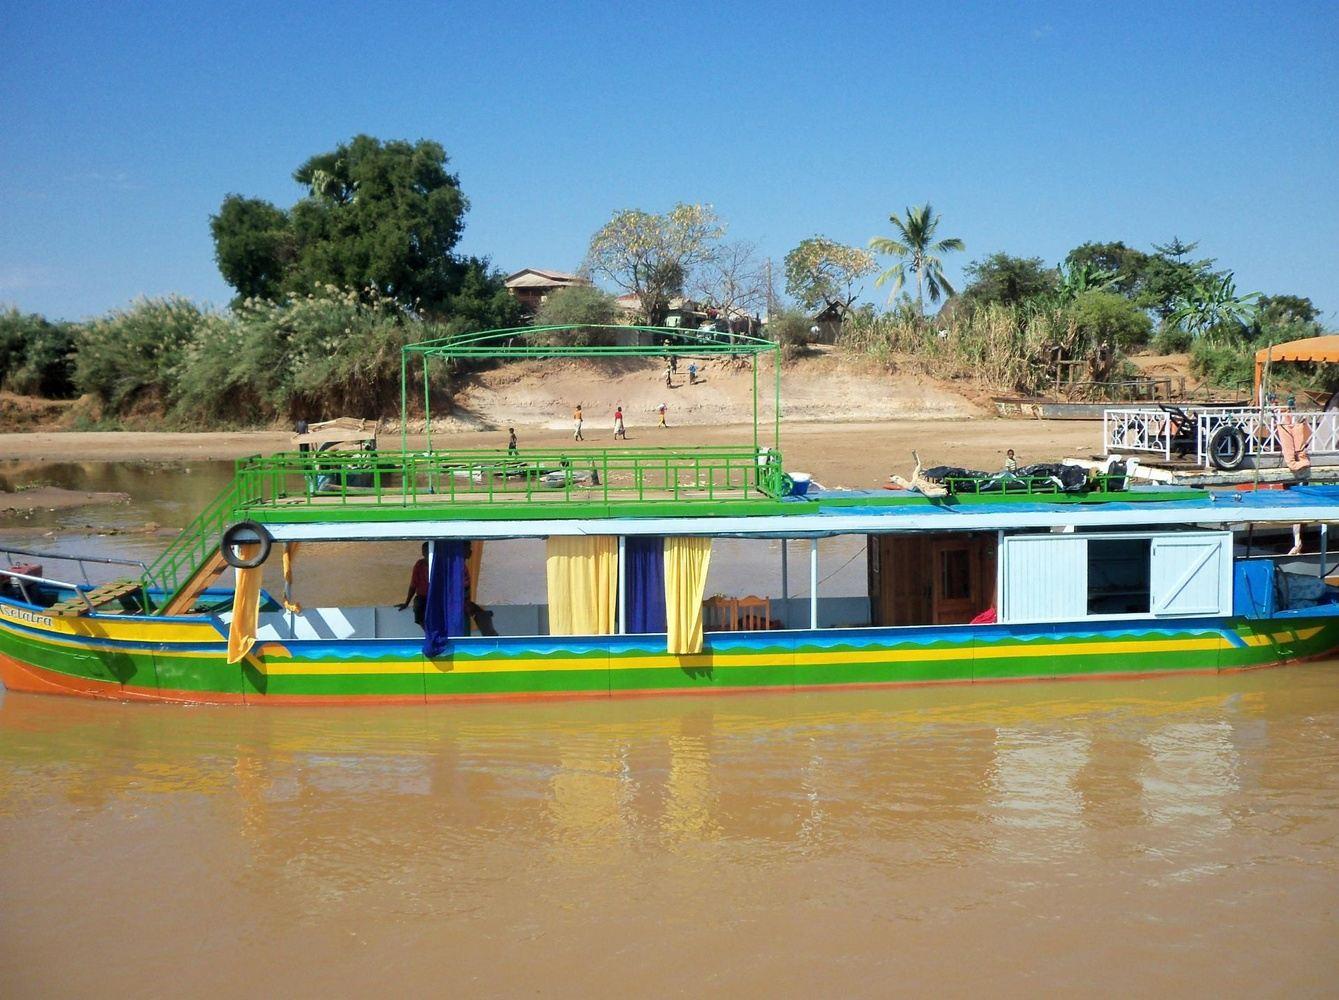 Descente de la Tsiribihina et transfert Masiakapy et aux Tsingy